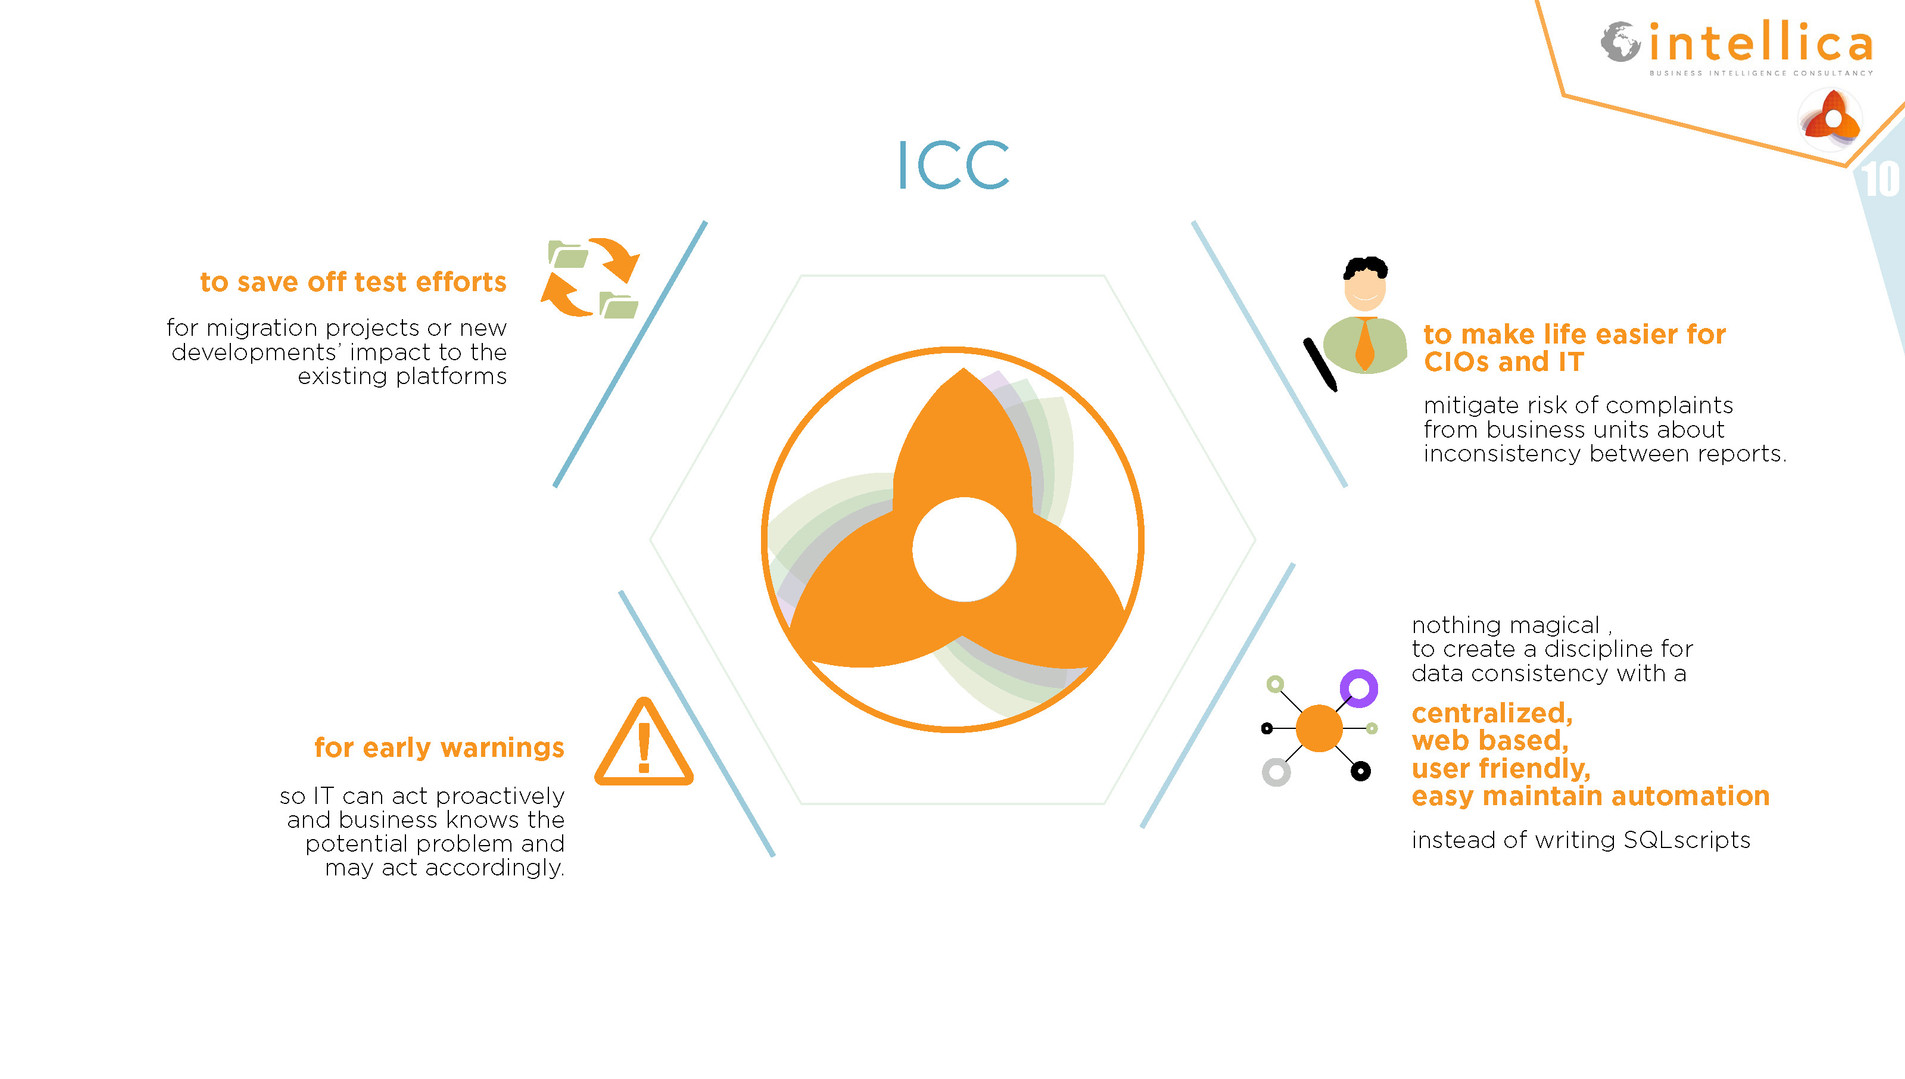 presentation_icc_karpov_2004_Page_12.jpg